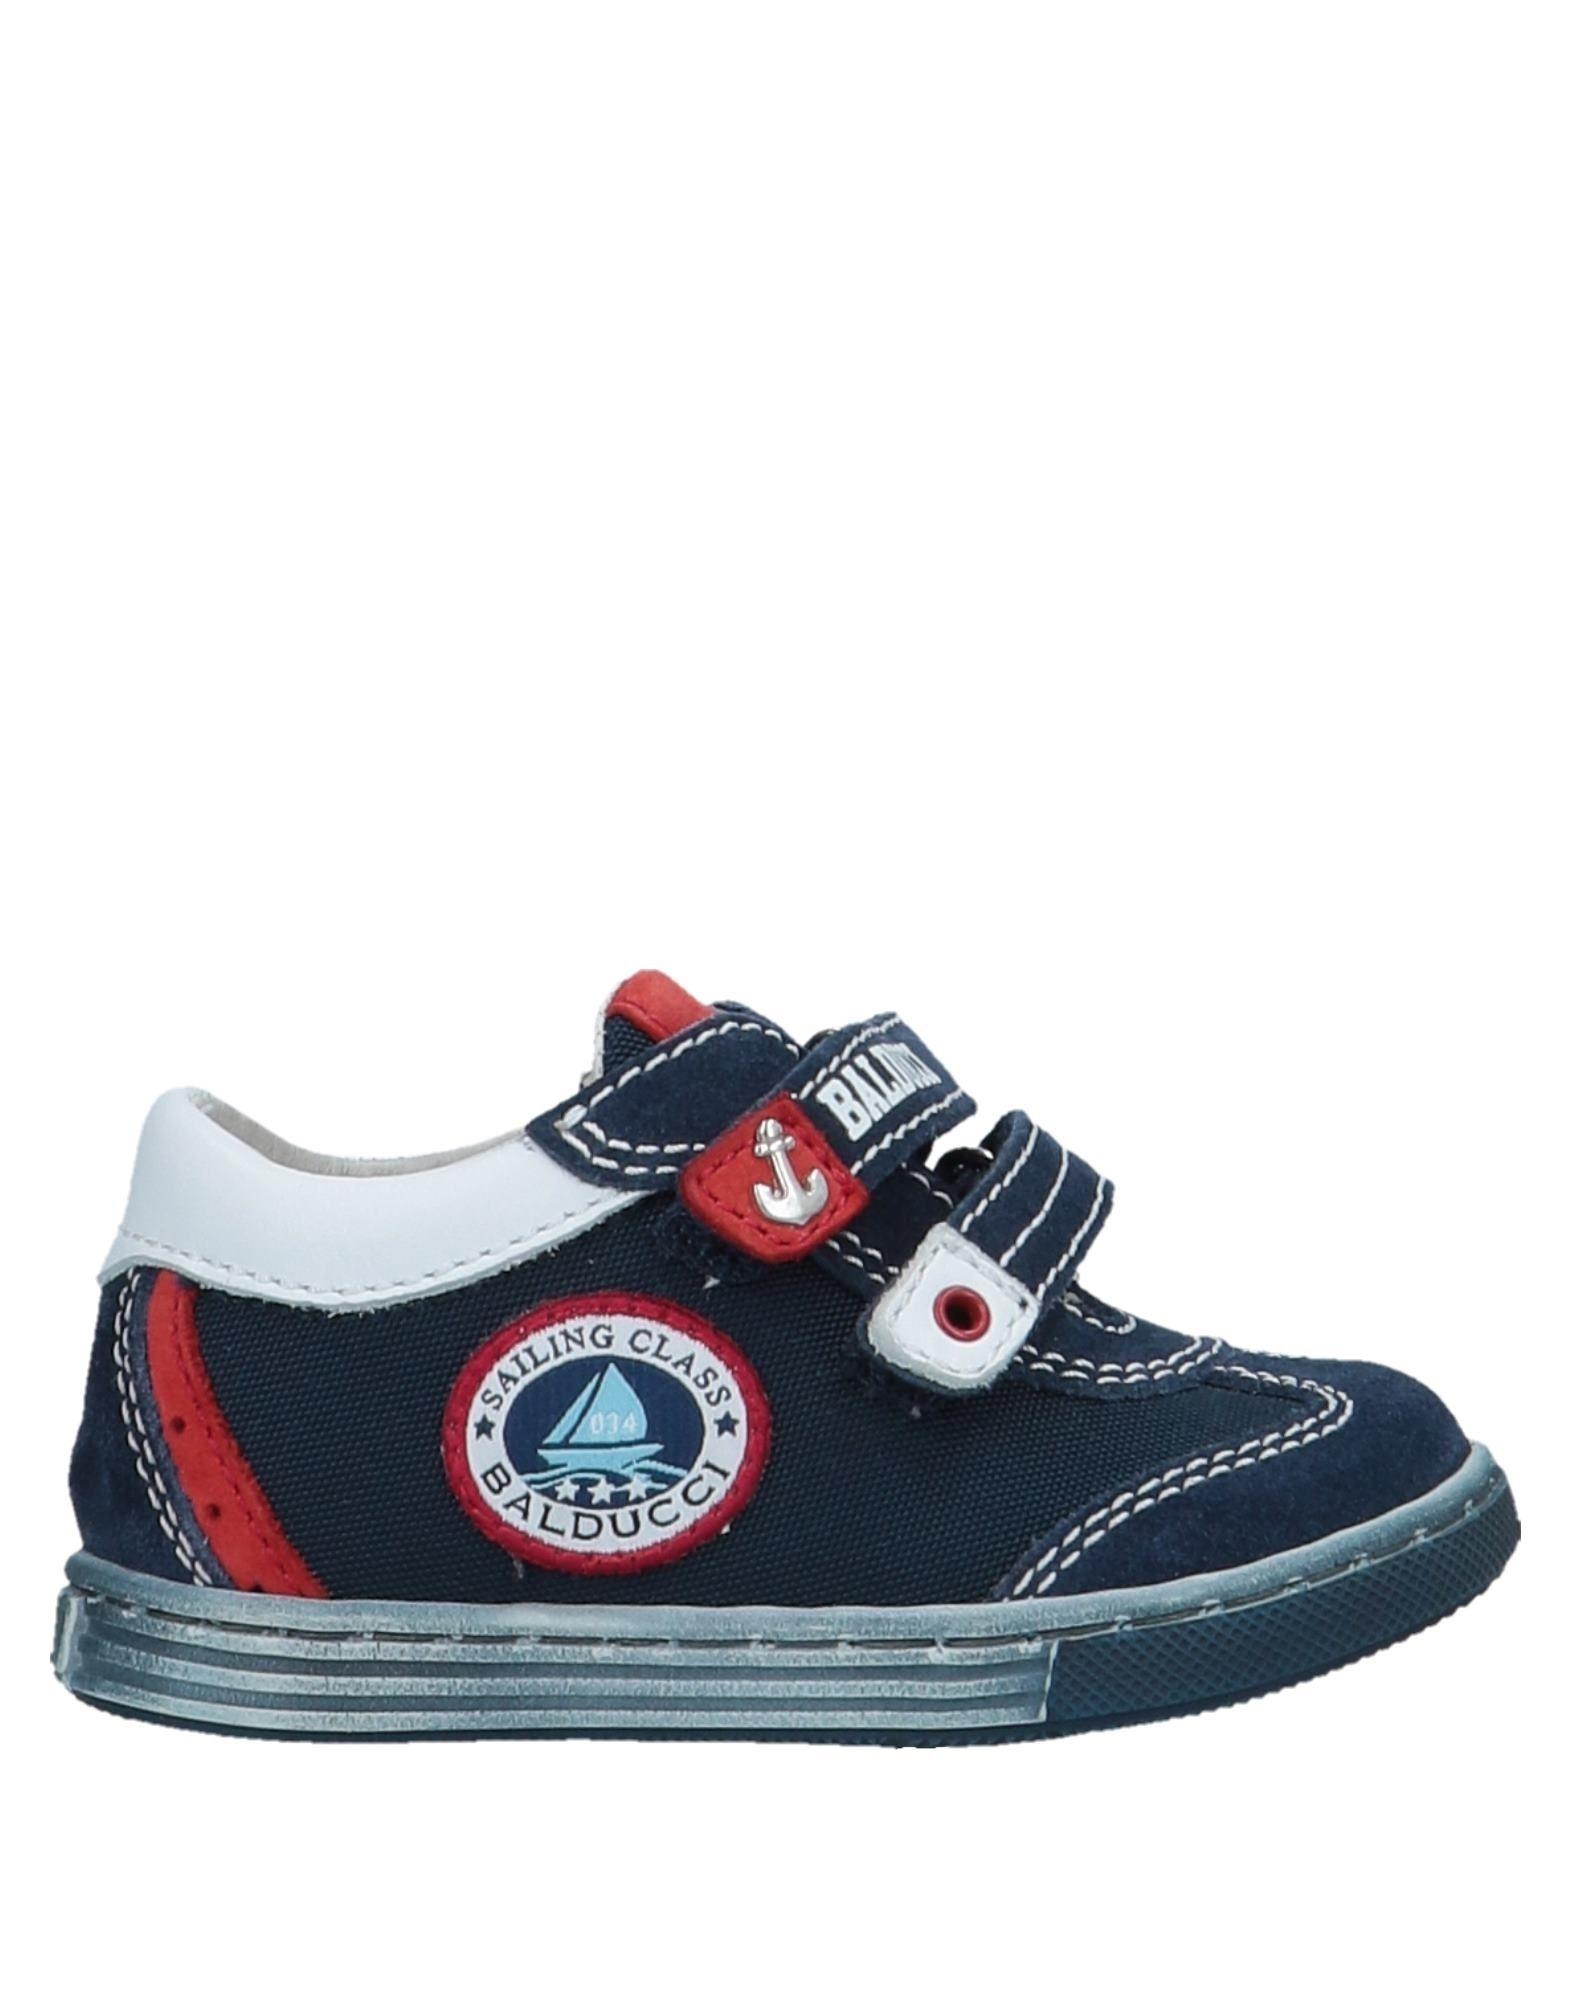 Sneakers Boy 0-24 months online on YOOX